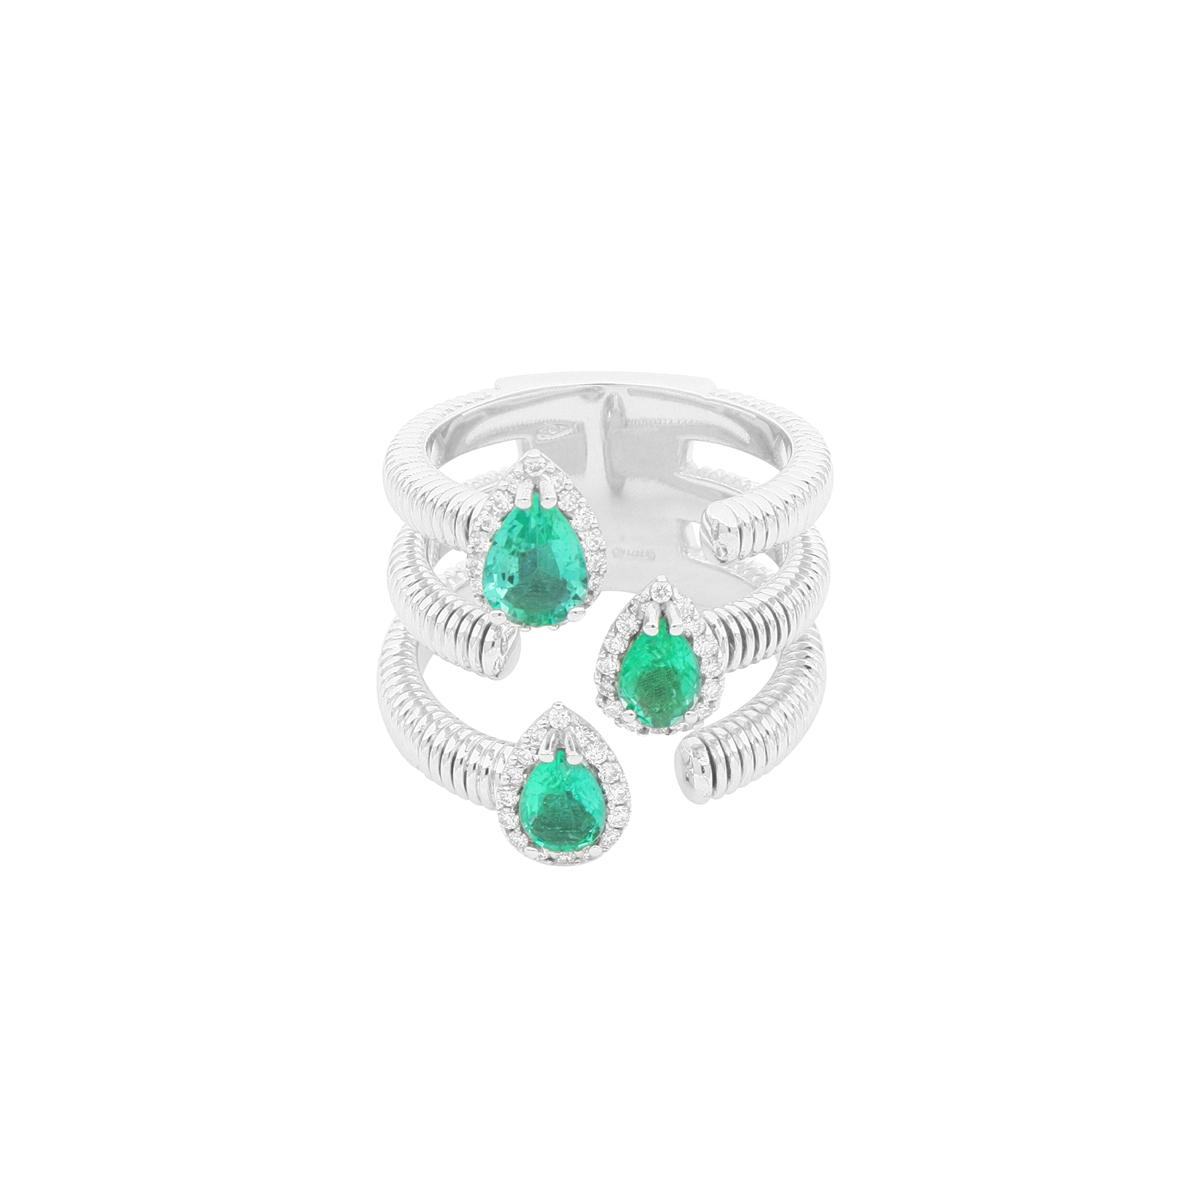 Three-Split Open-Top Ring with Pear-Cut Emerald Gemstones